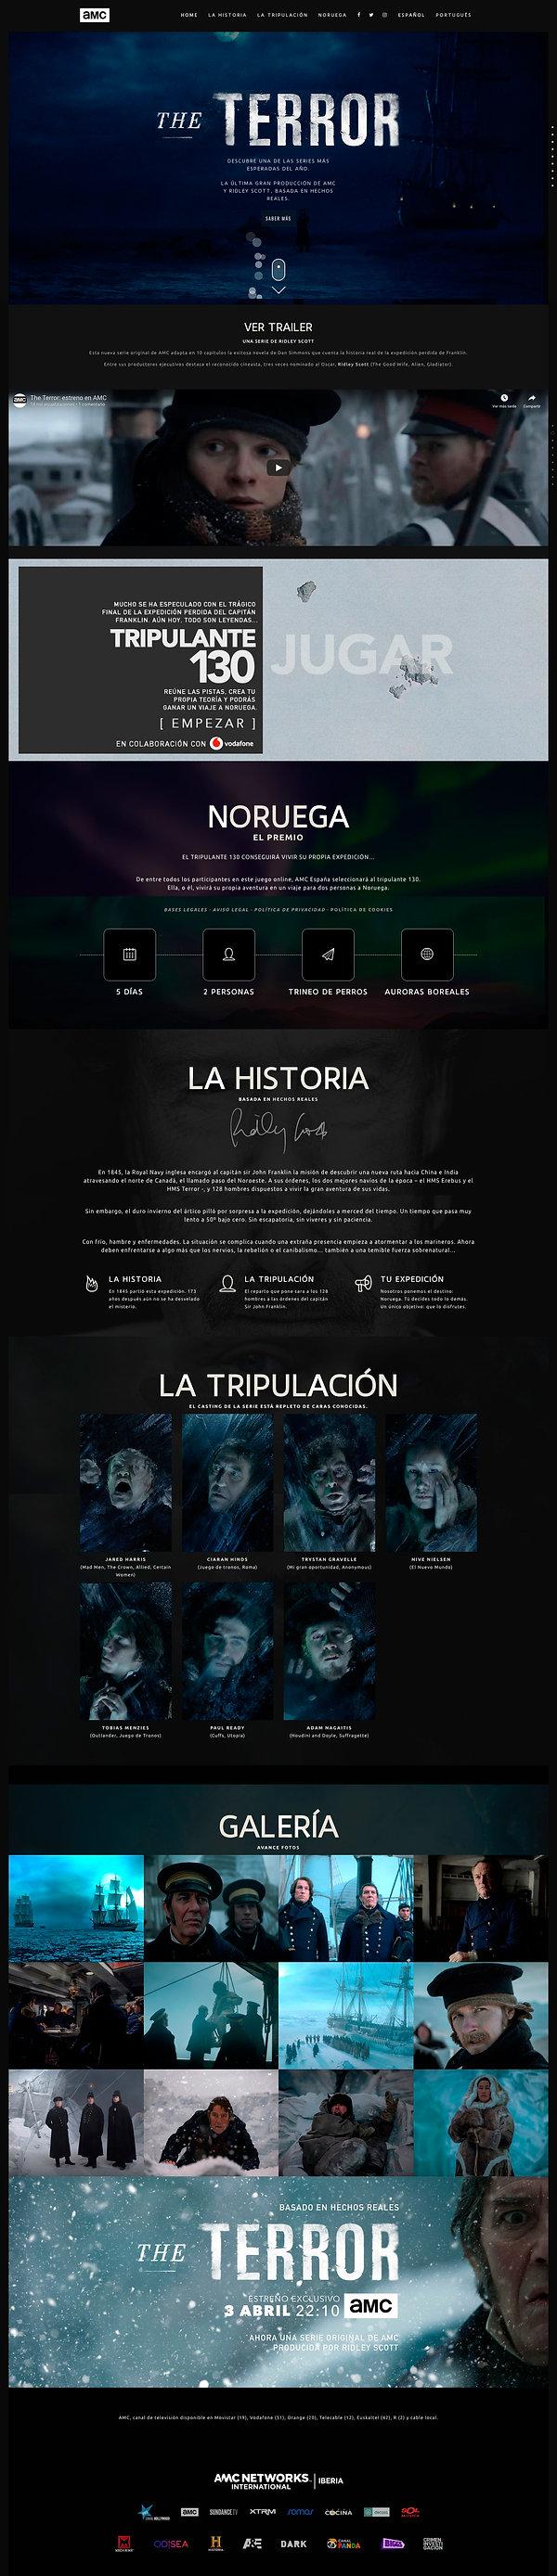 The Terror Ridley Scott